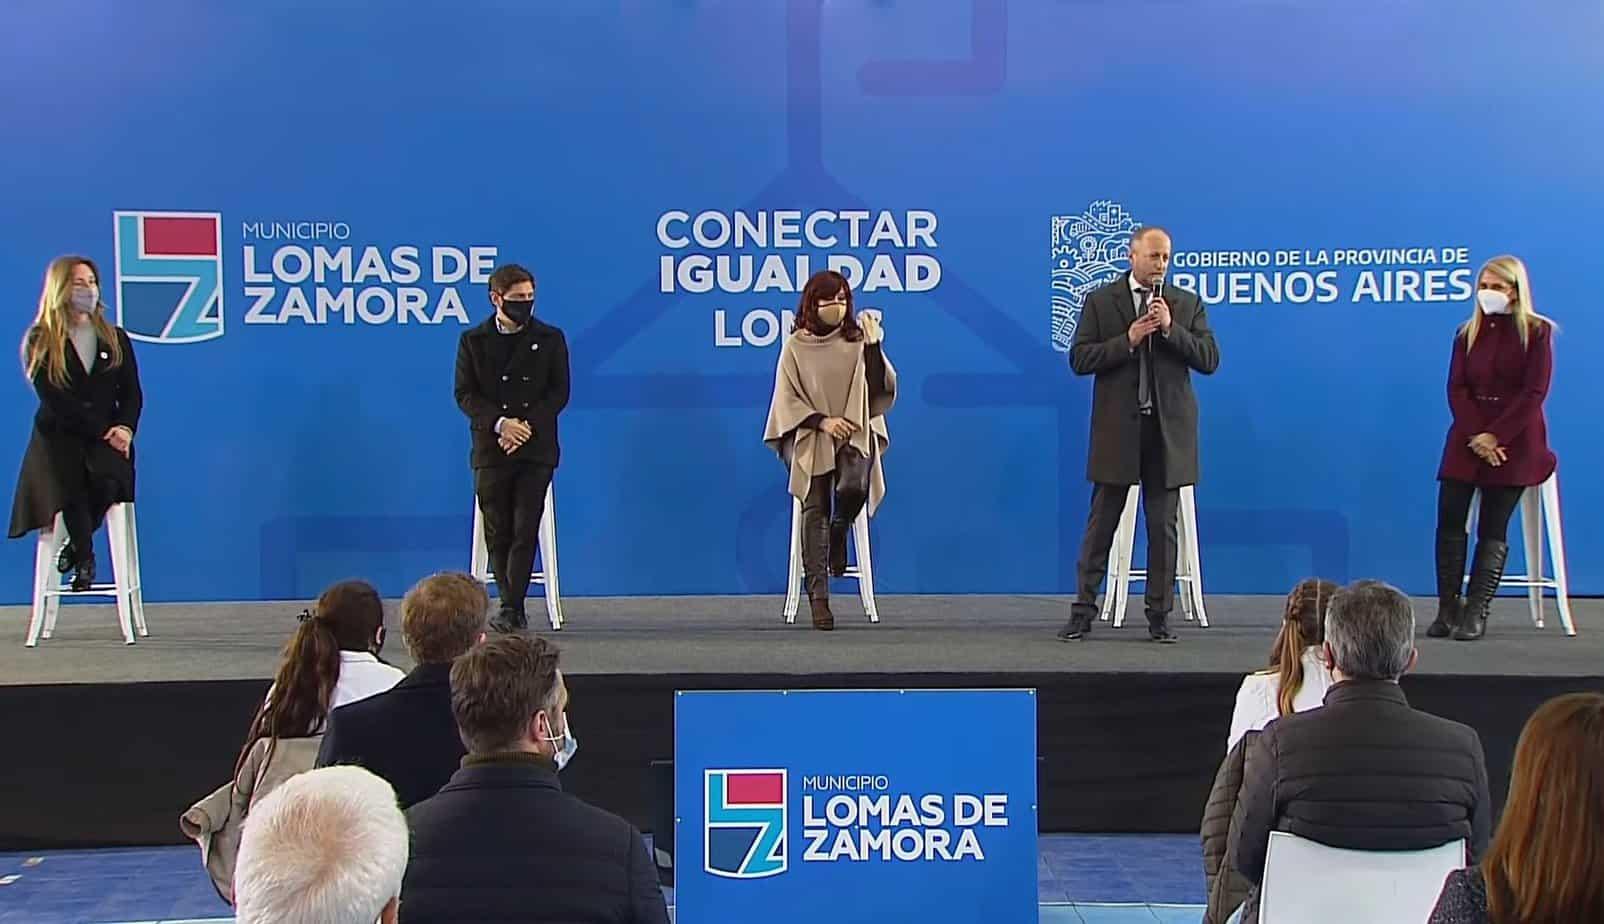 Cristina Lomas